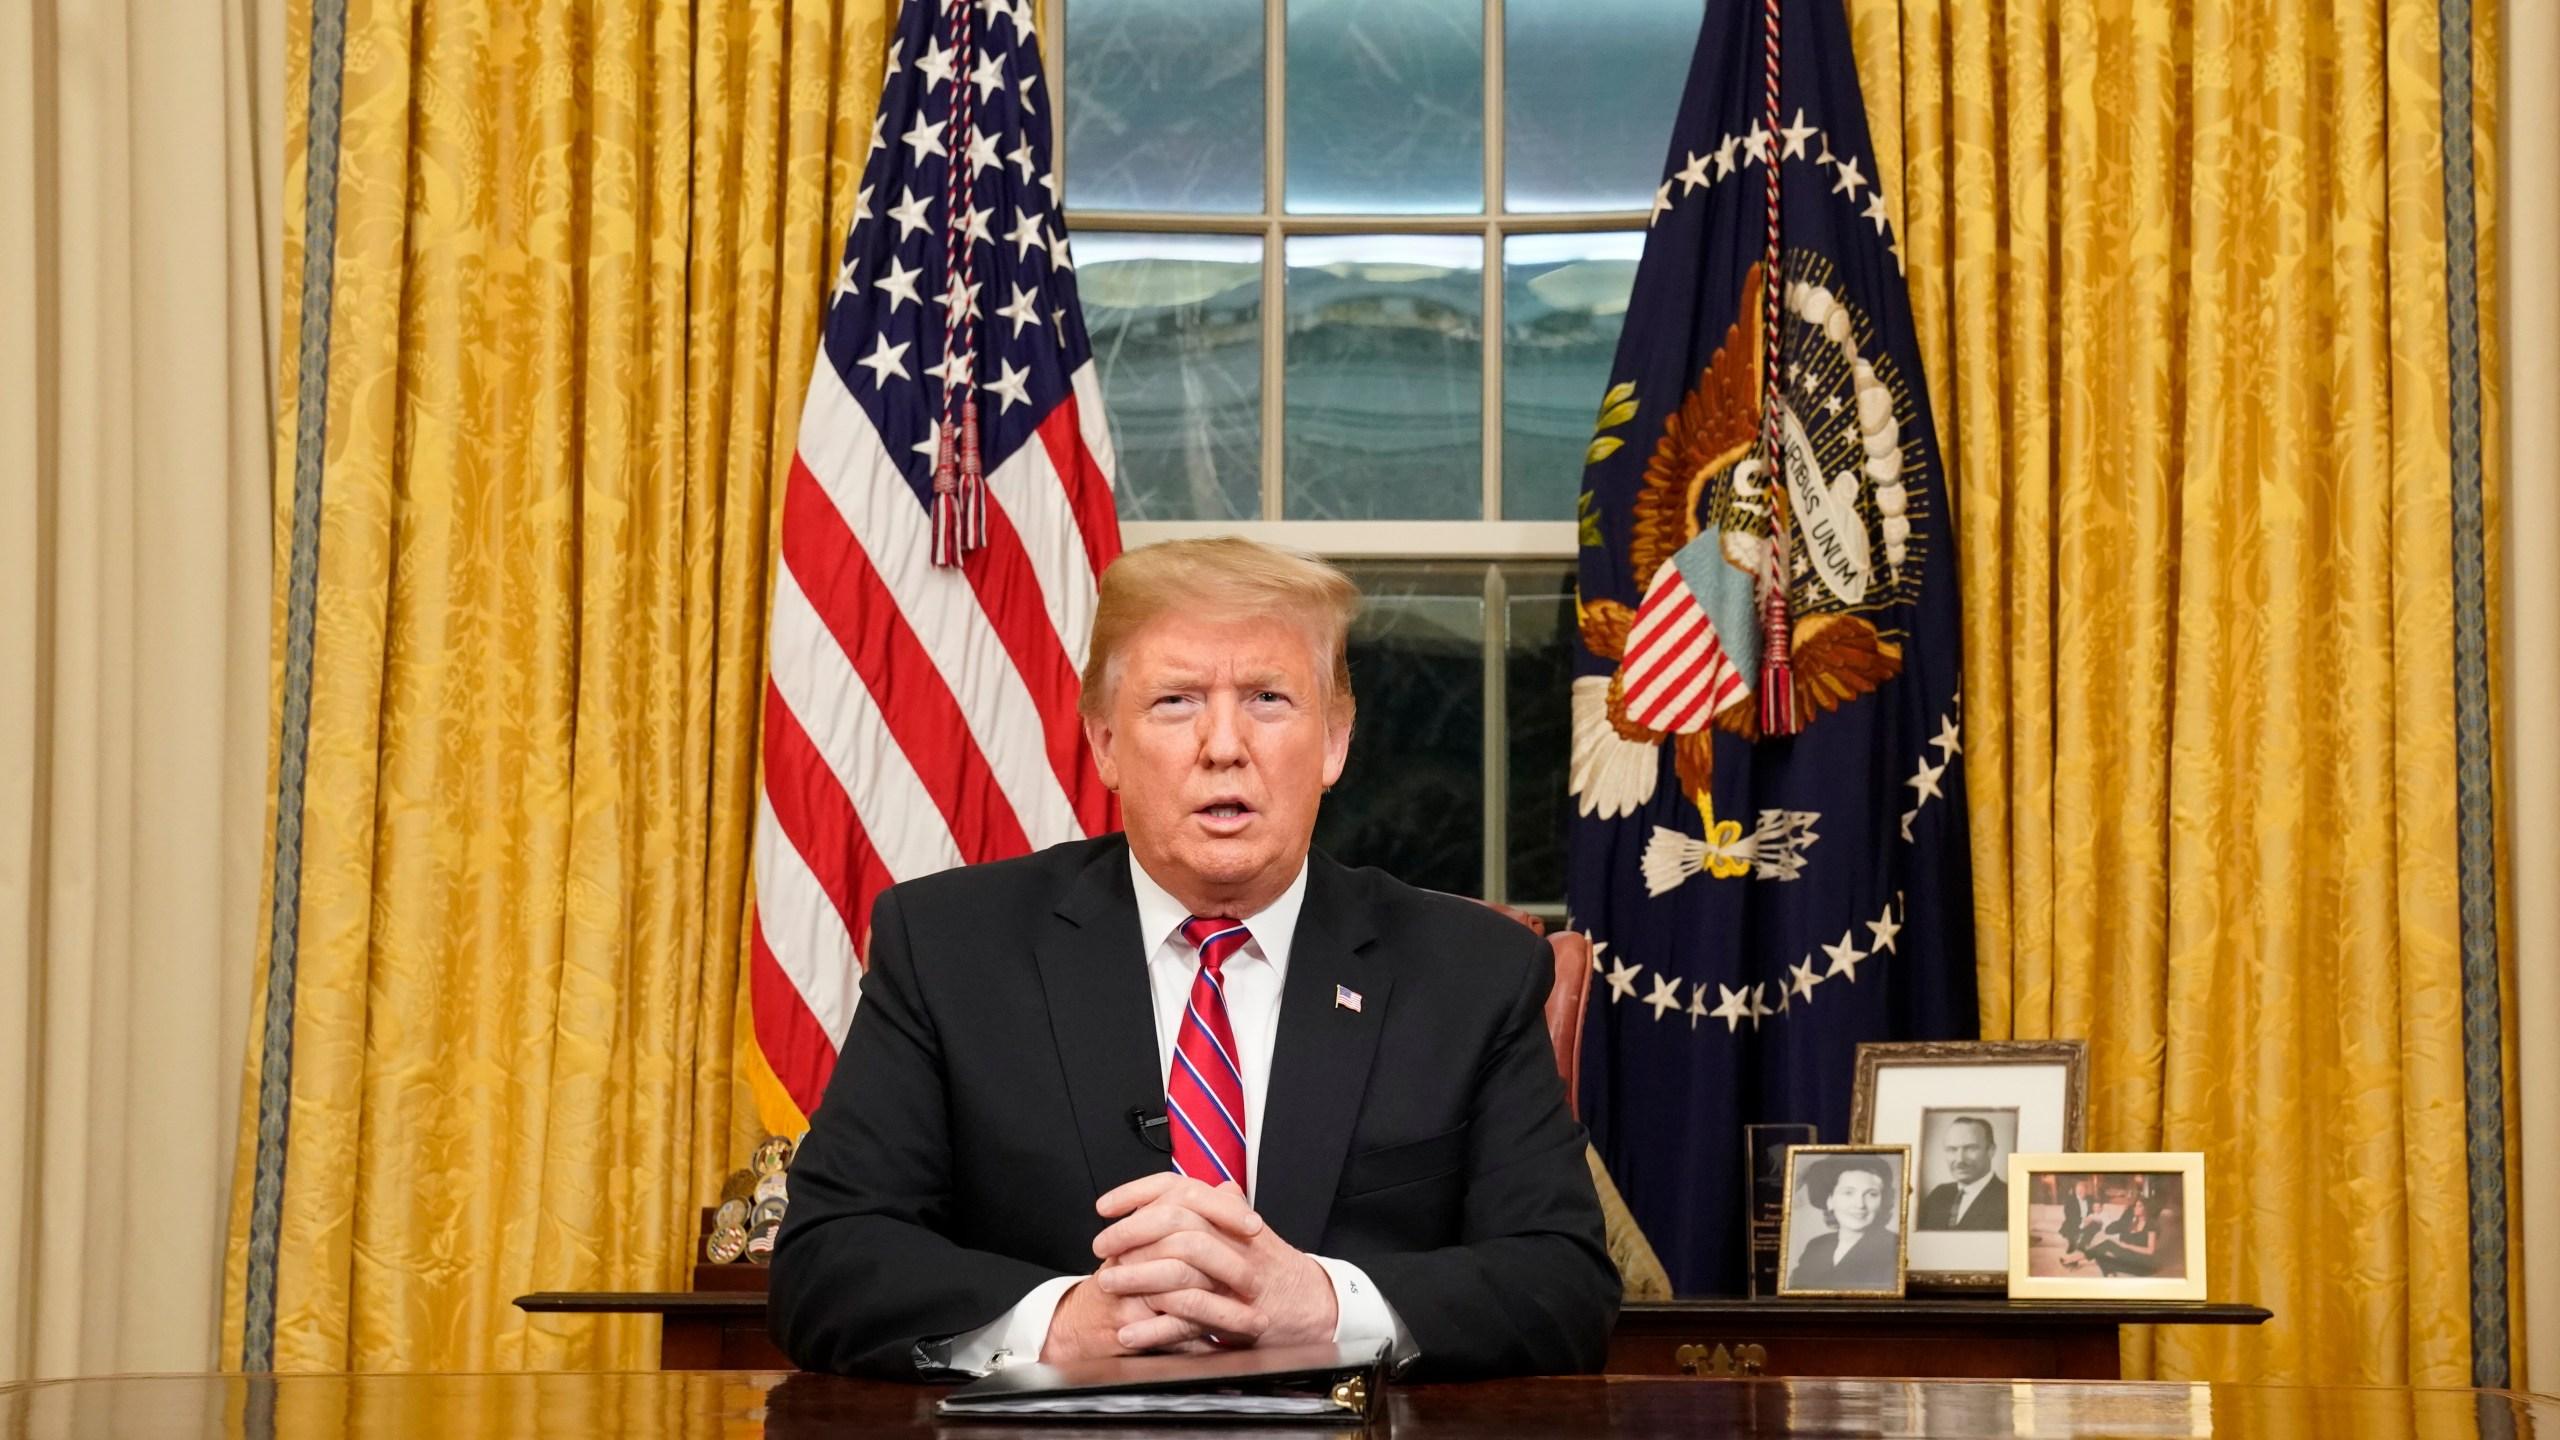 APTOPIX_Government_Shutdown_Trump_85773-159532.jpg00386278